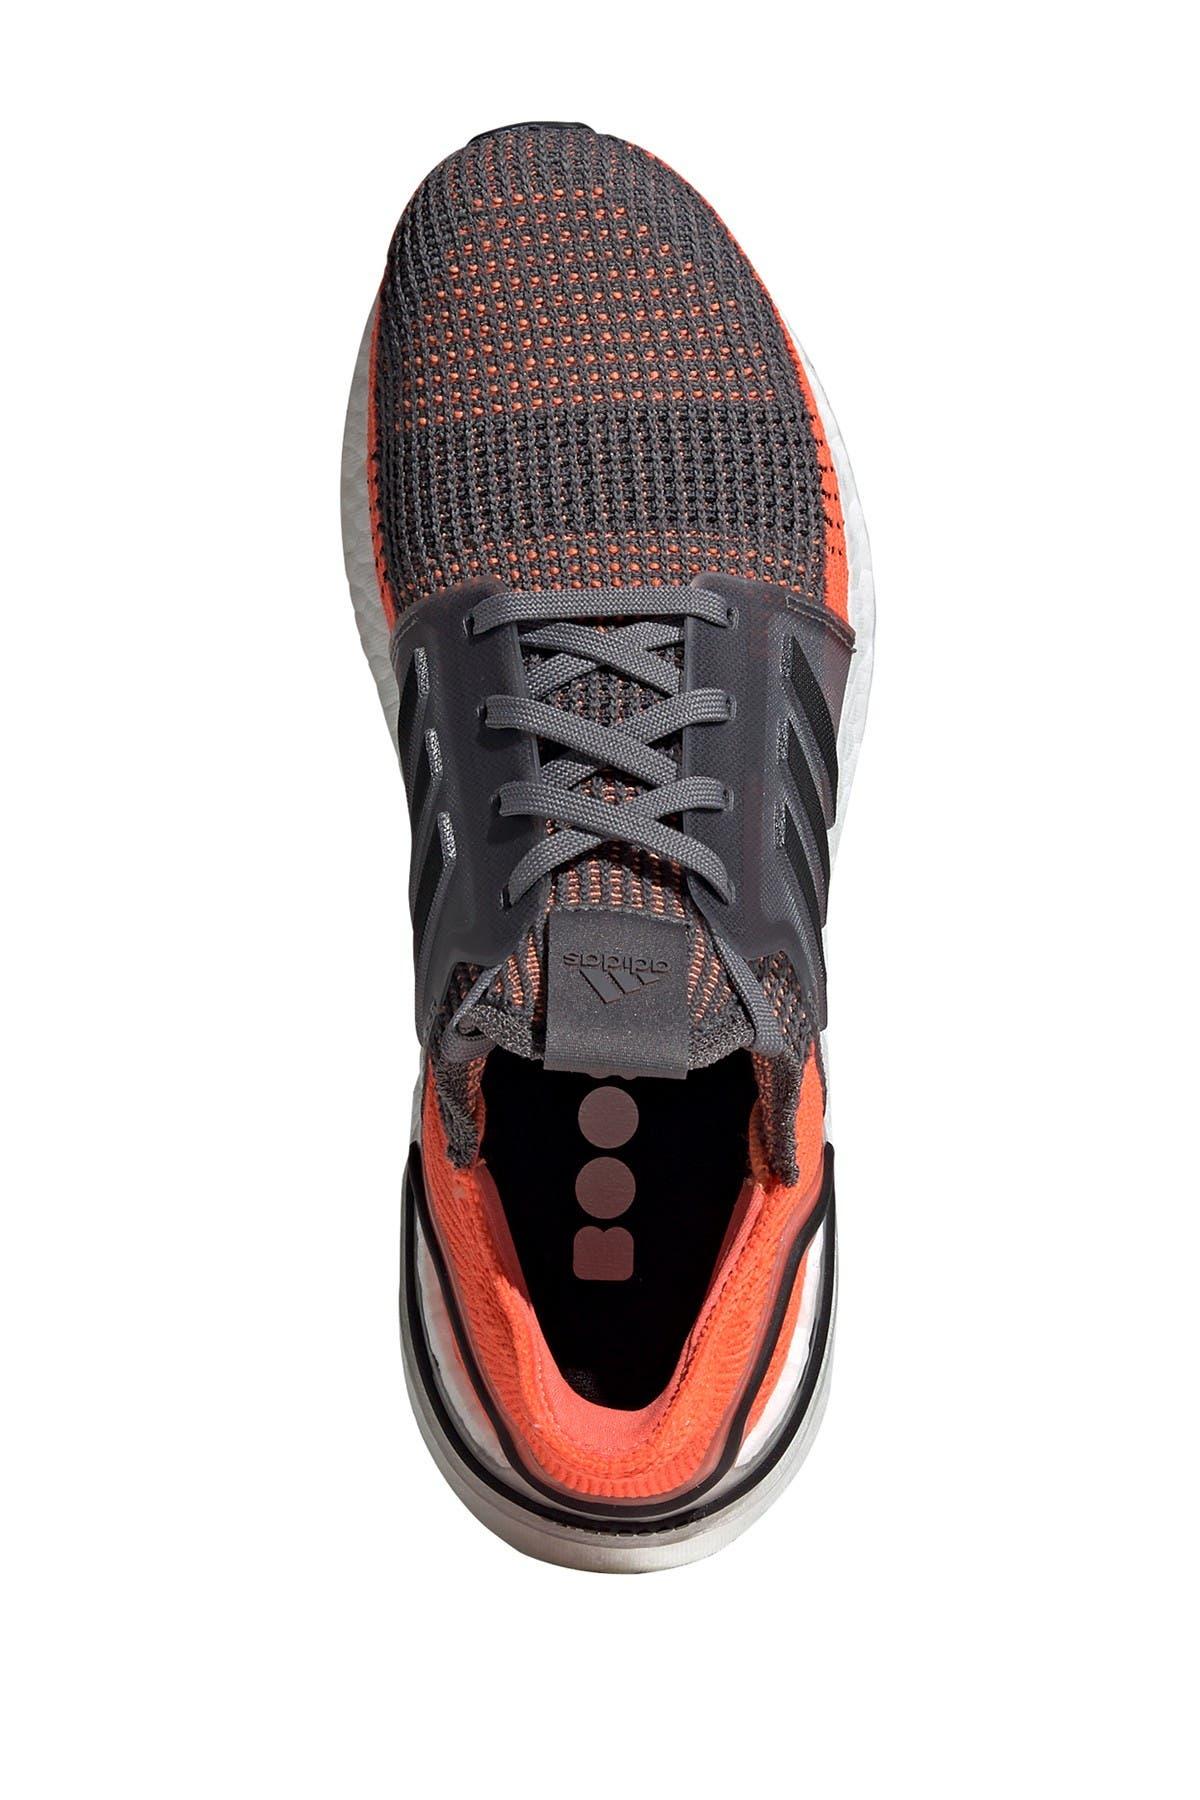 Image of adidas UltraBoost 19 Sneaker